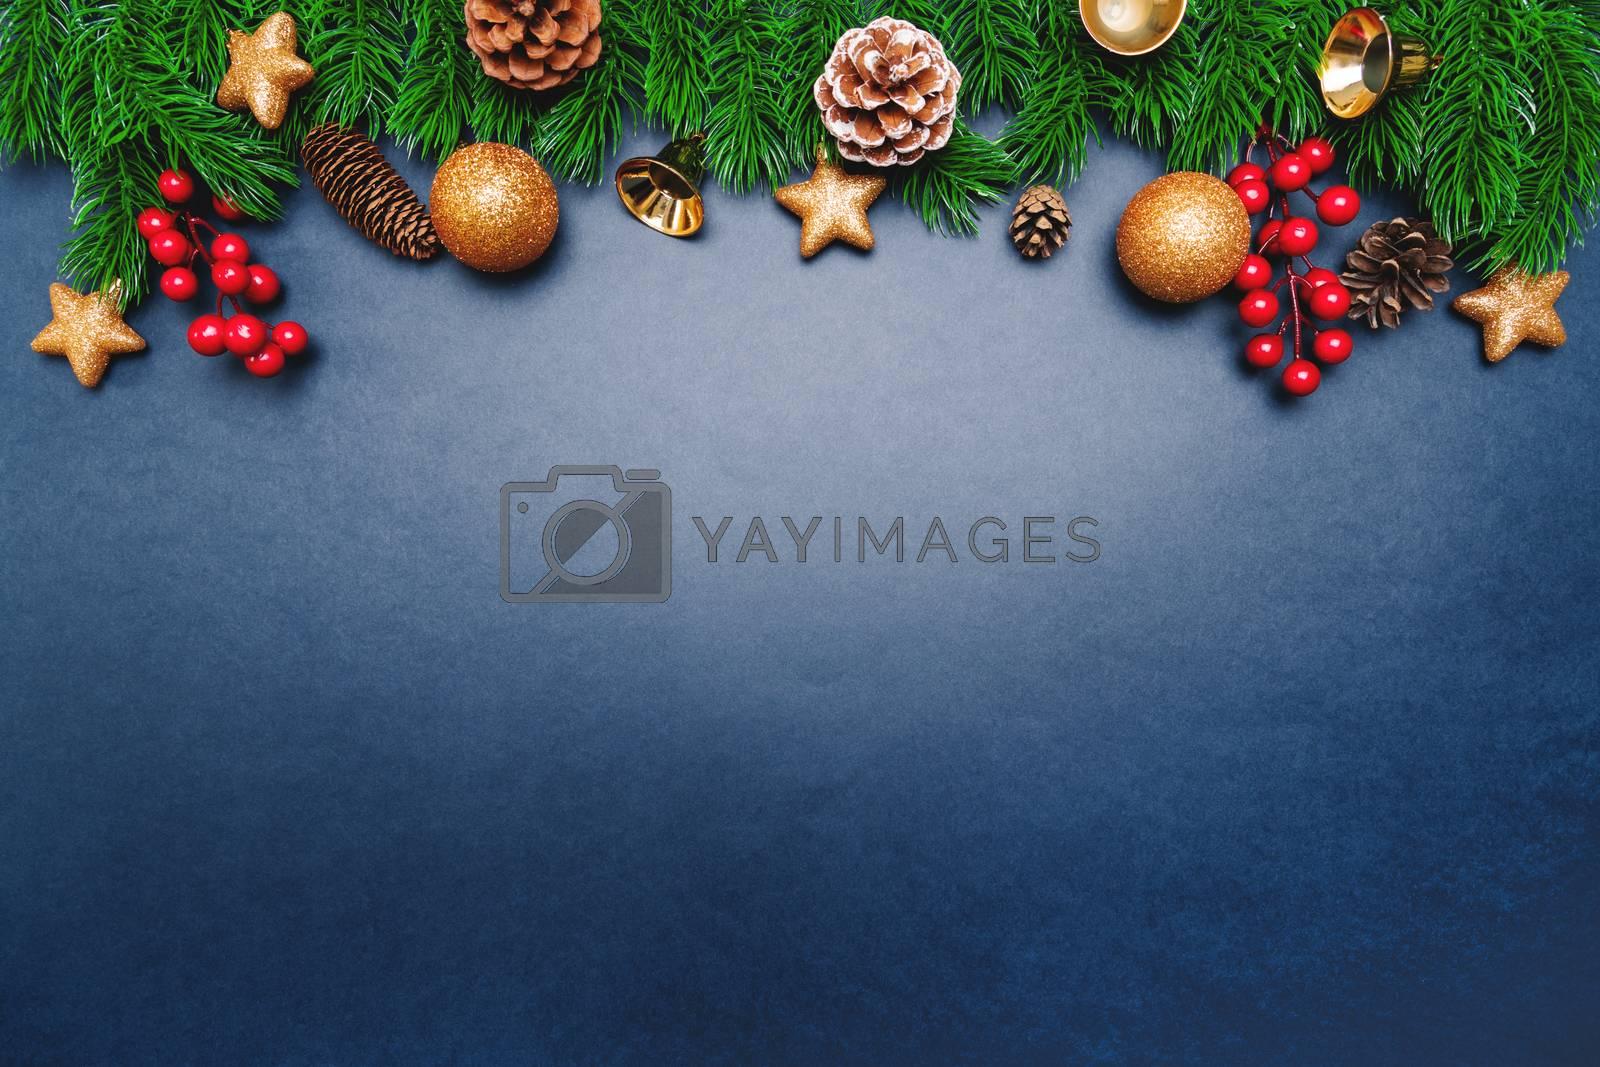 Christmas pine tree with xmas decoration on blue background